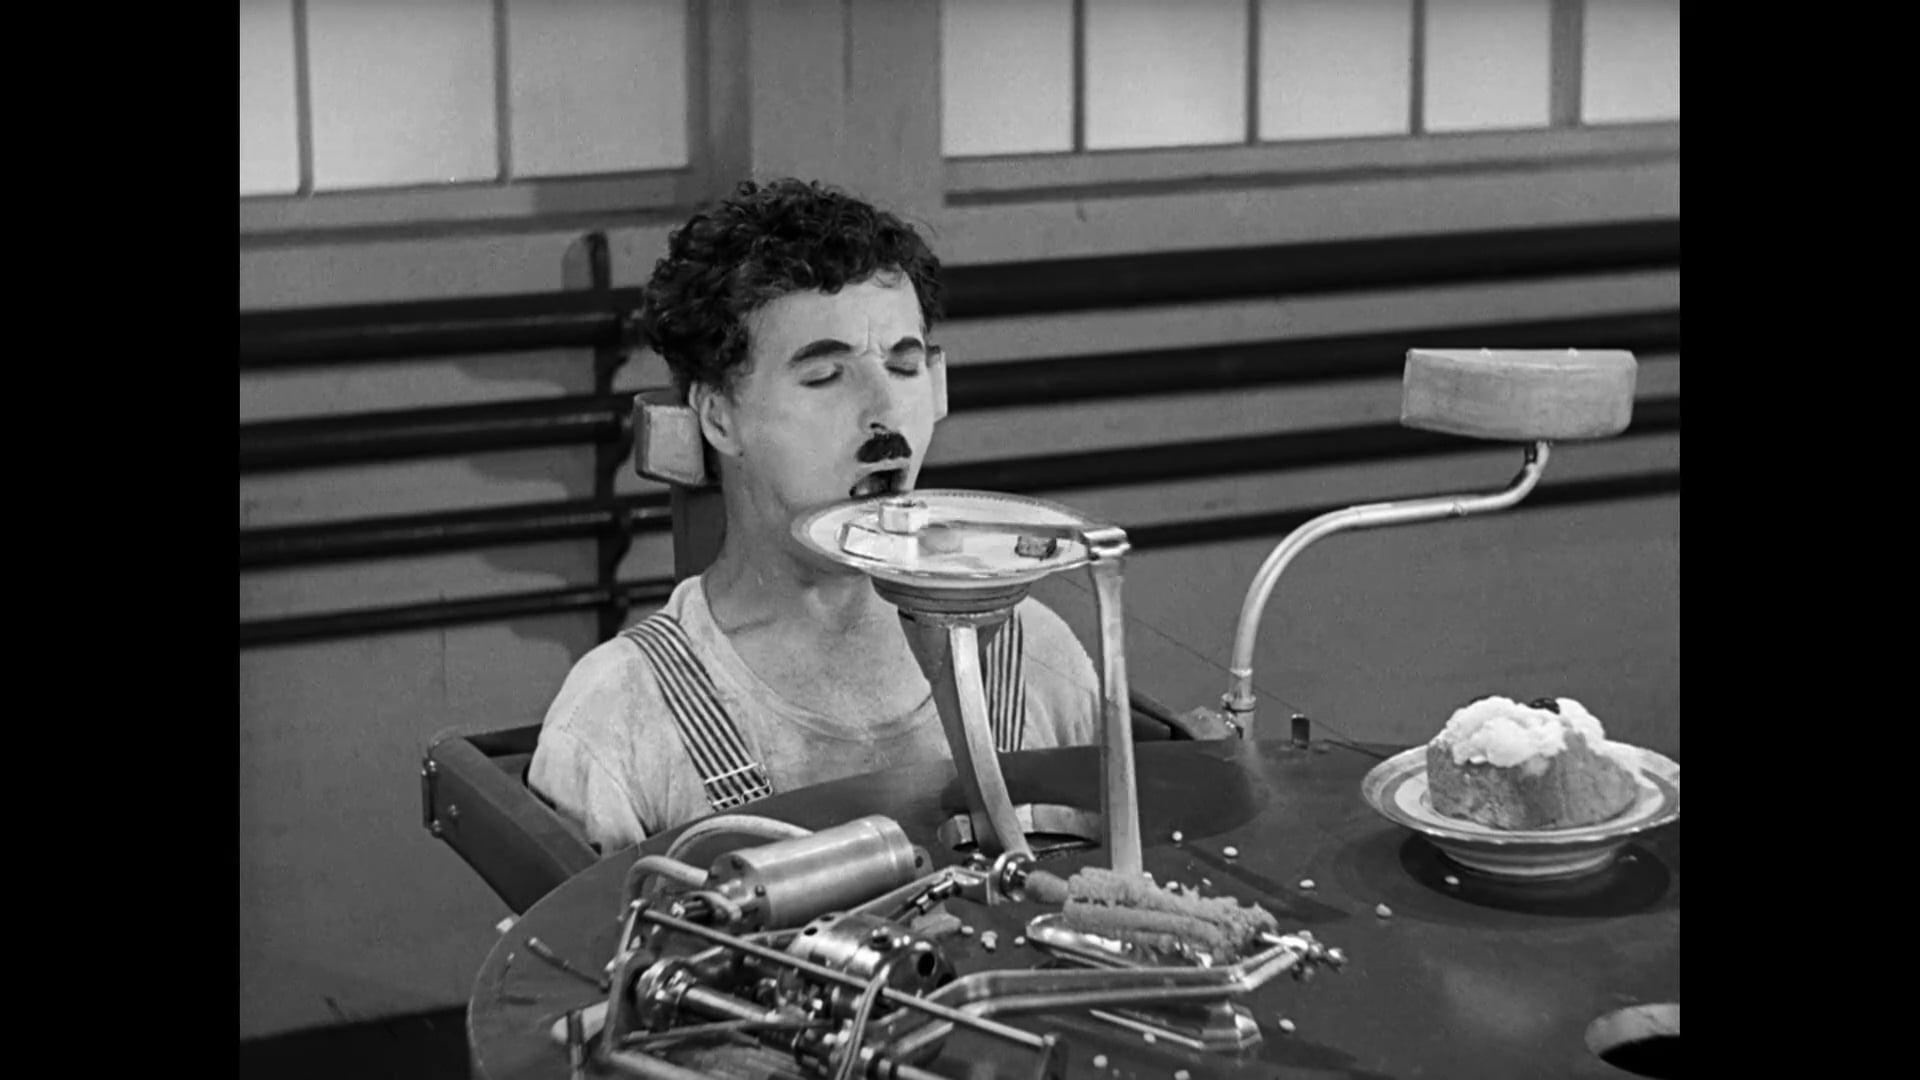 Anatomy of a Gag: Choking Chaplin